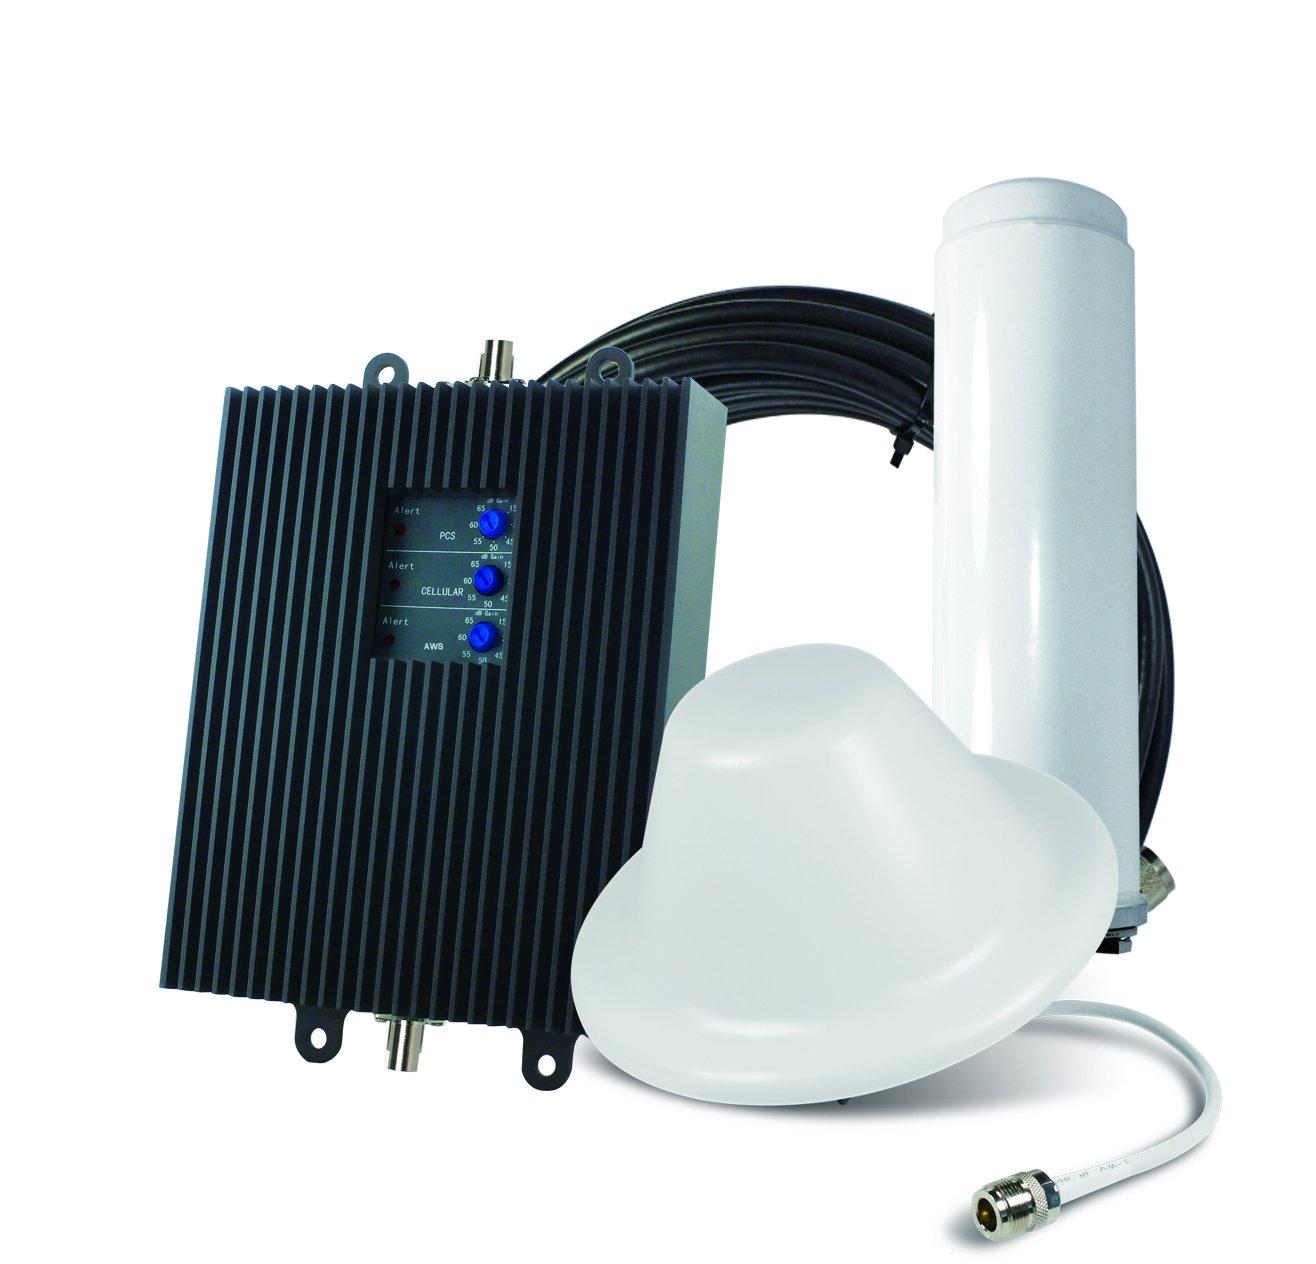 SureCall TriFlex-V Verizon 4G Cell Phone Signal Booster w/ Omni & Dome Antennas   SC-TriVH/O-72-OD-KIT